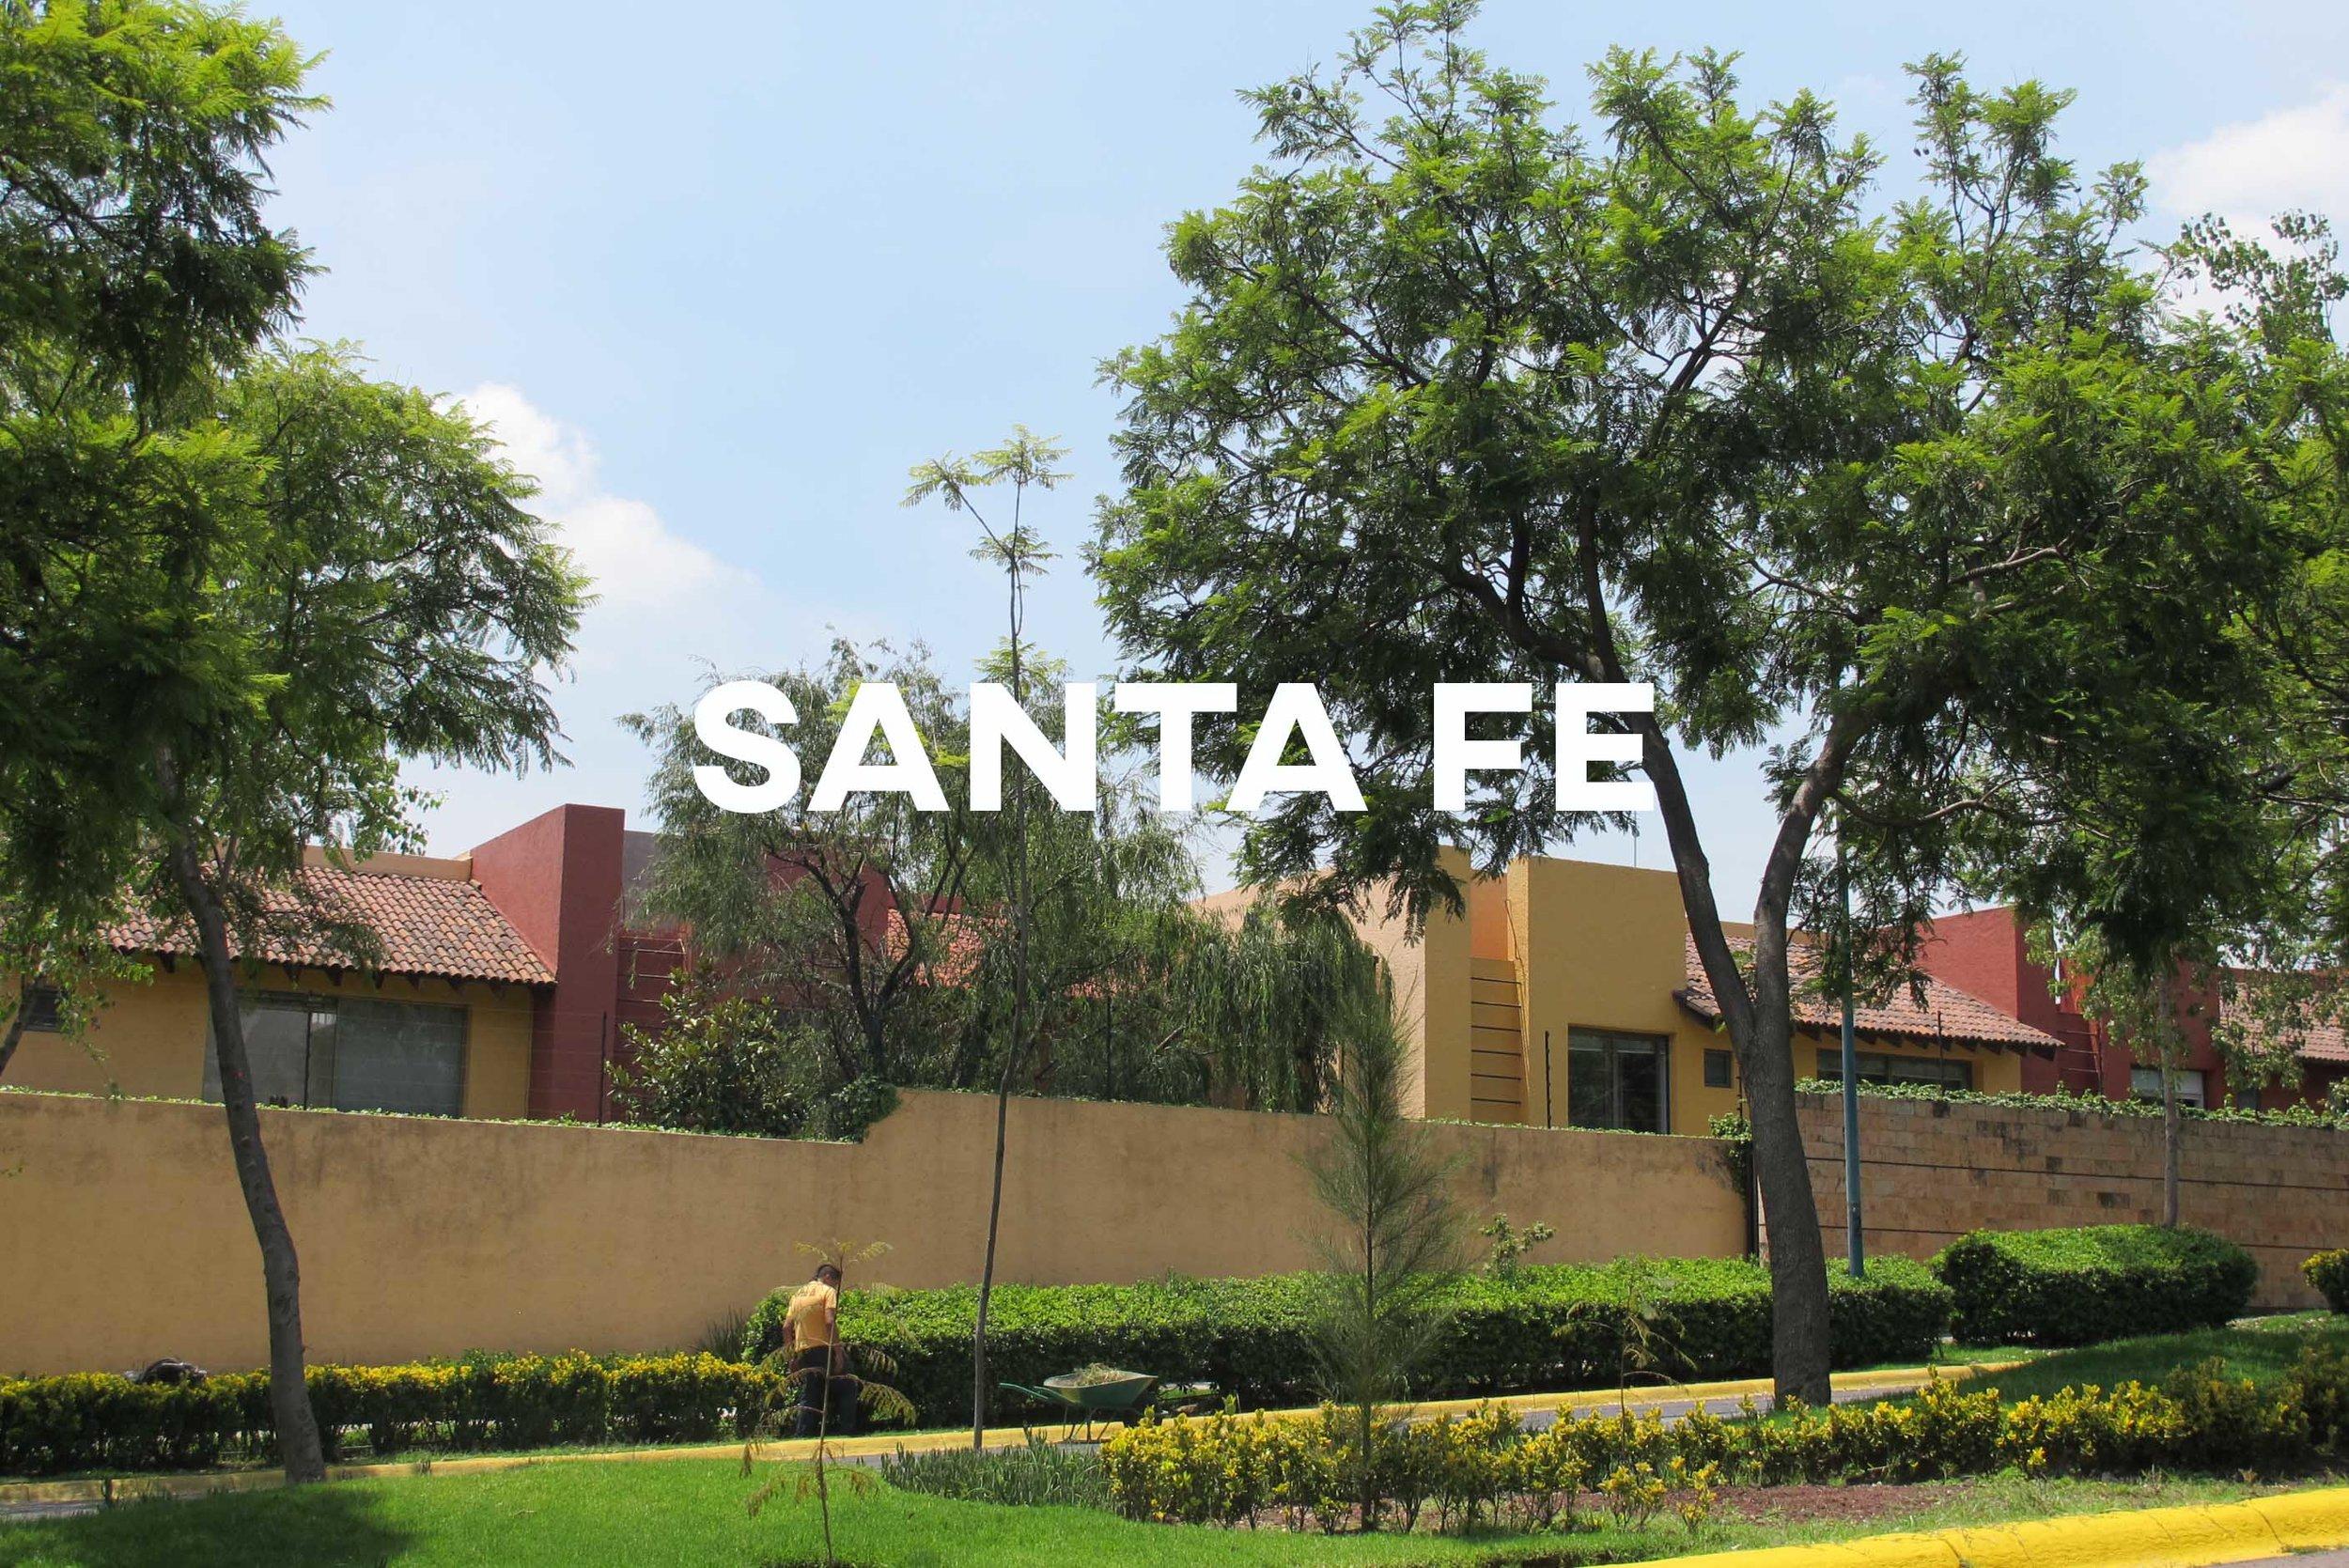 Santa Fe - A youthful & vibrant neighborhood with urban charm